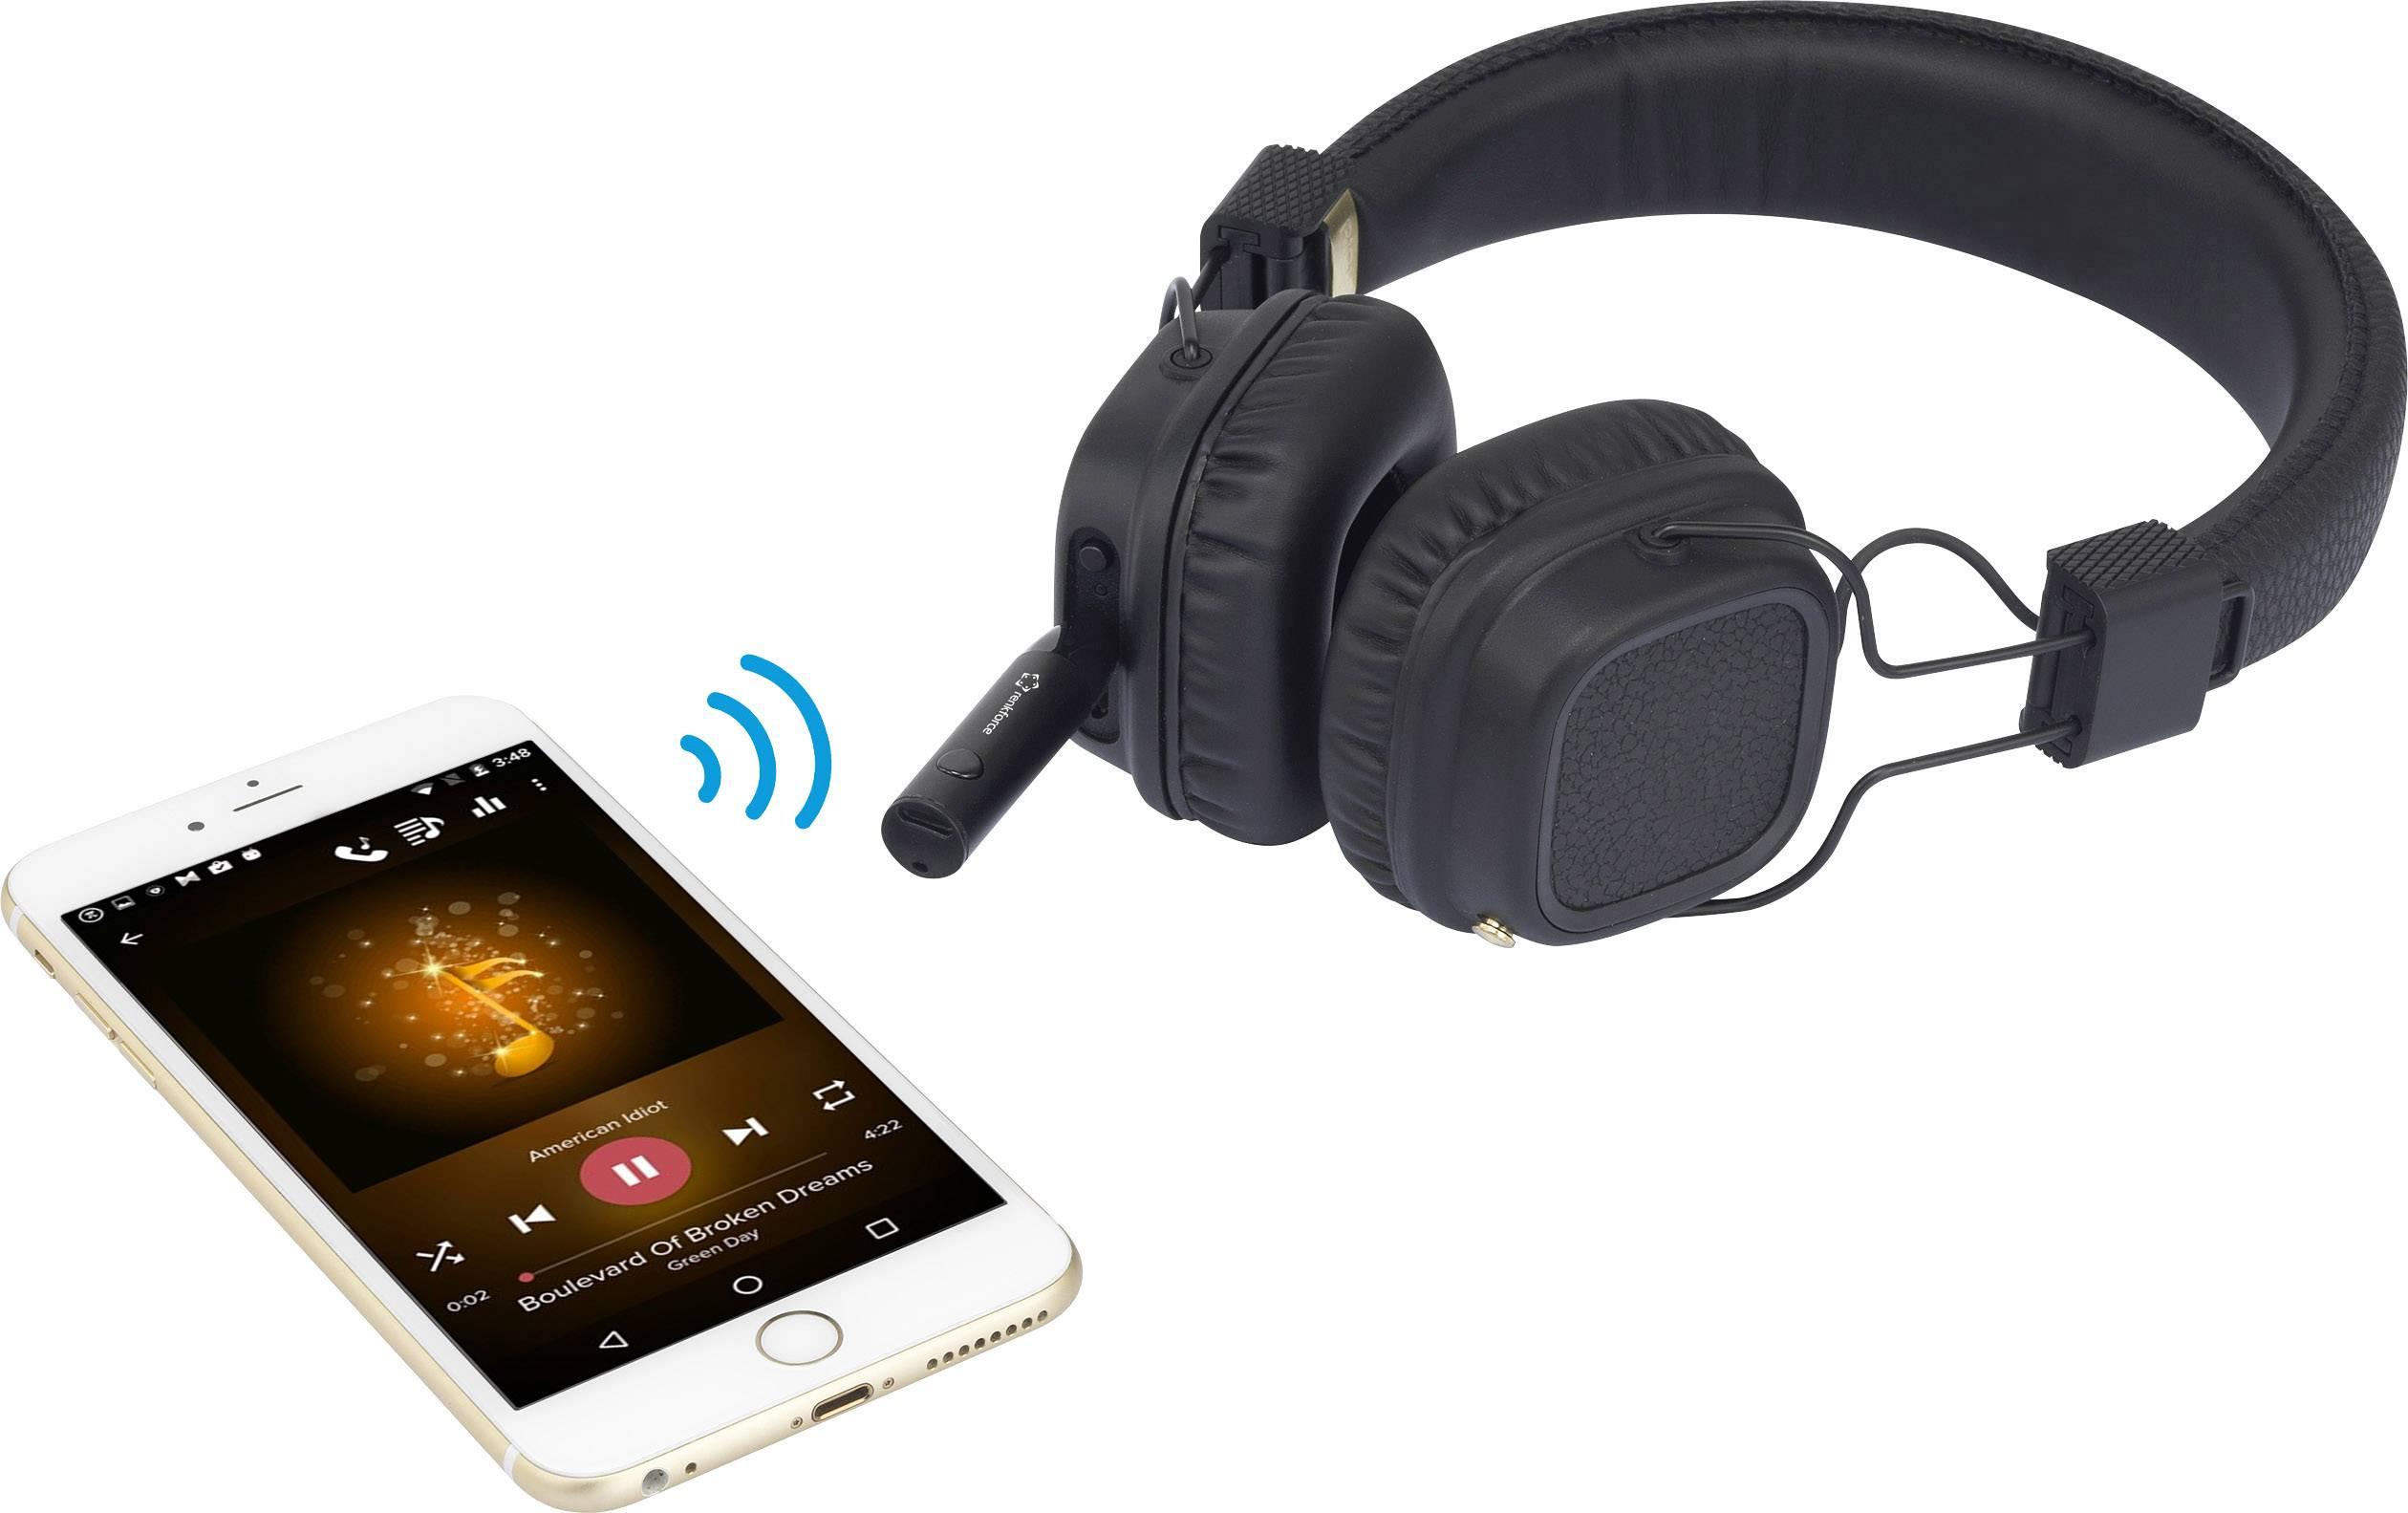 Renkforce RF-BTR-1000 Bluetooth® sprejemnik glasbe Bluetooth: A2DP, AVRCP, 5.0 10 m za slušalke